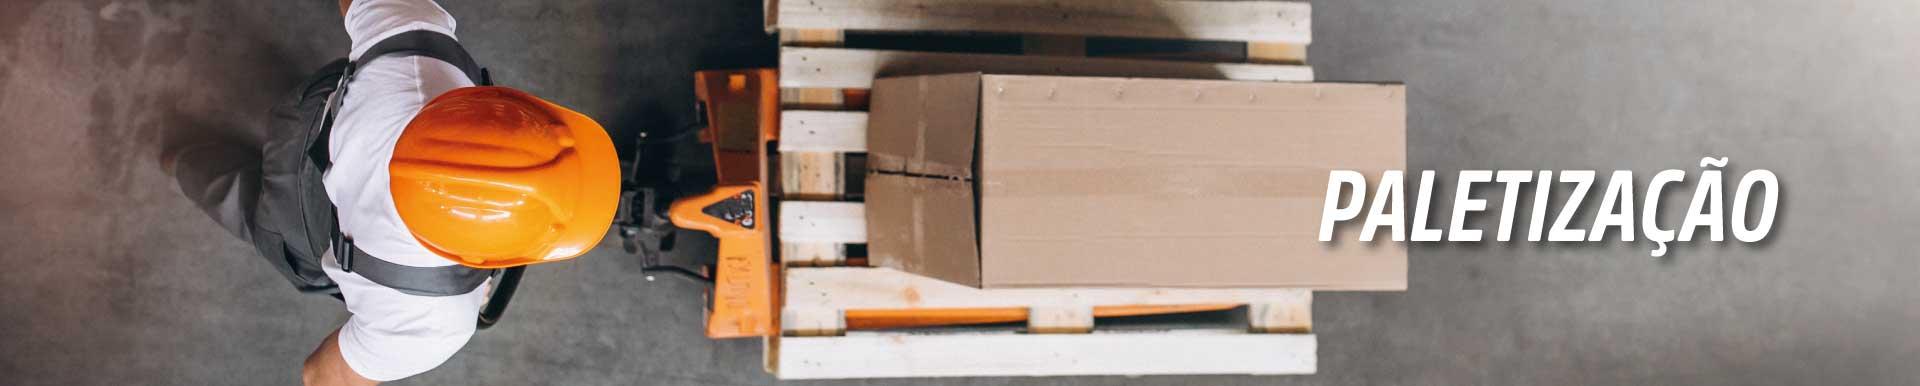 venture cargo serviços - paletizacao